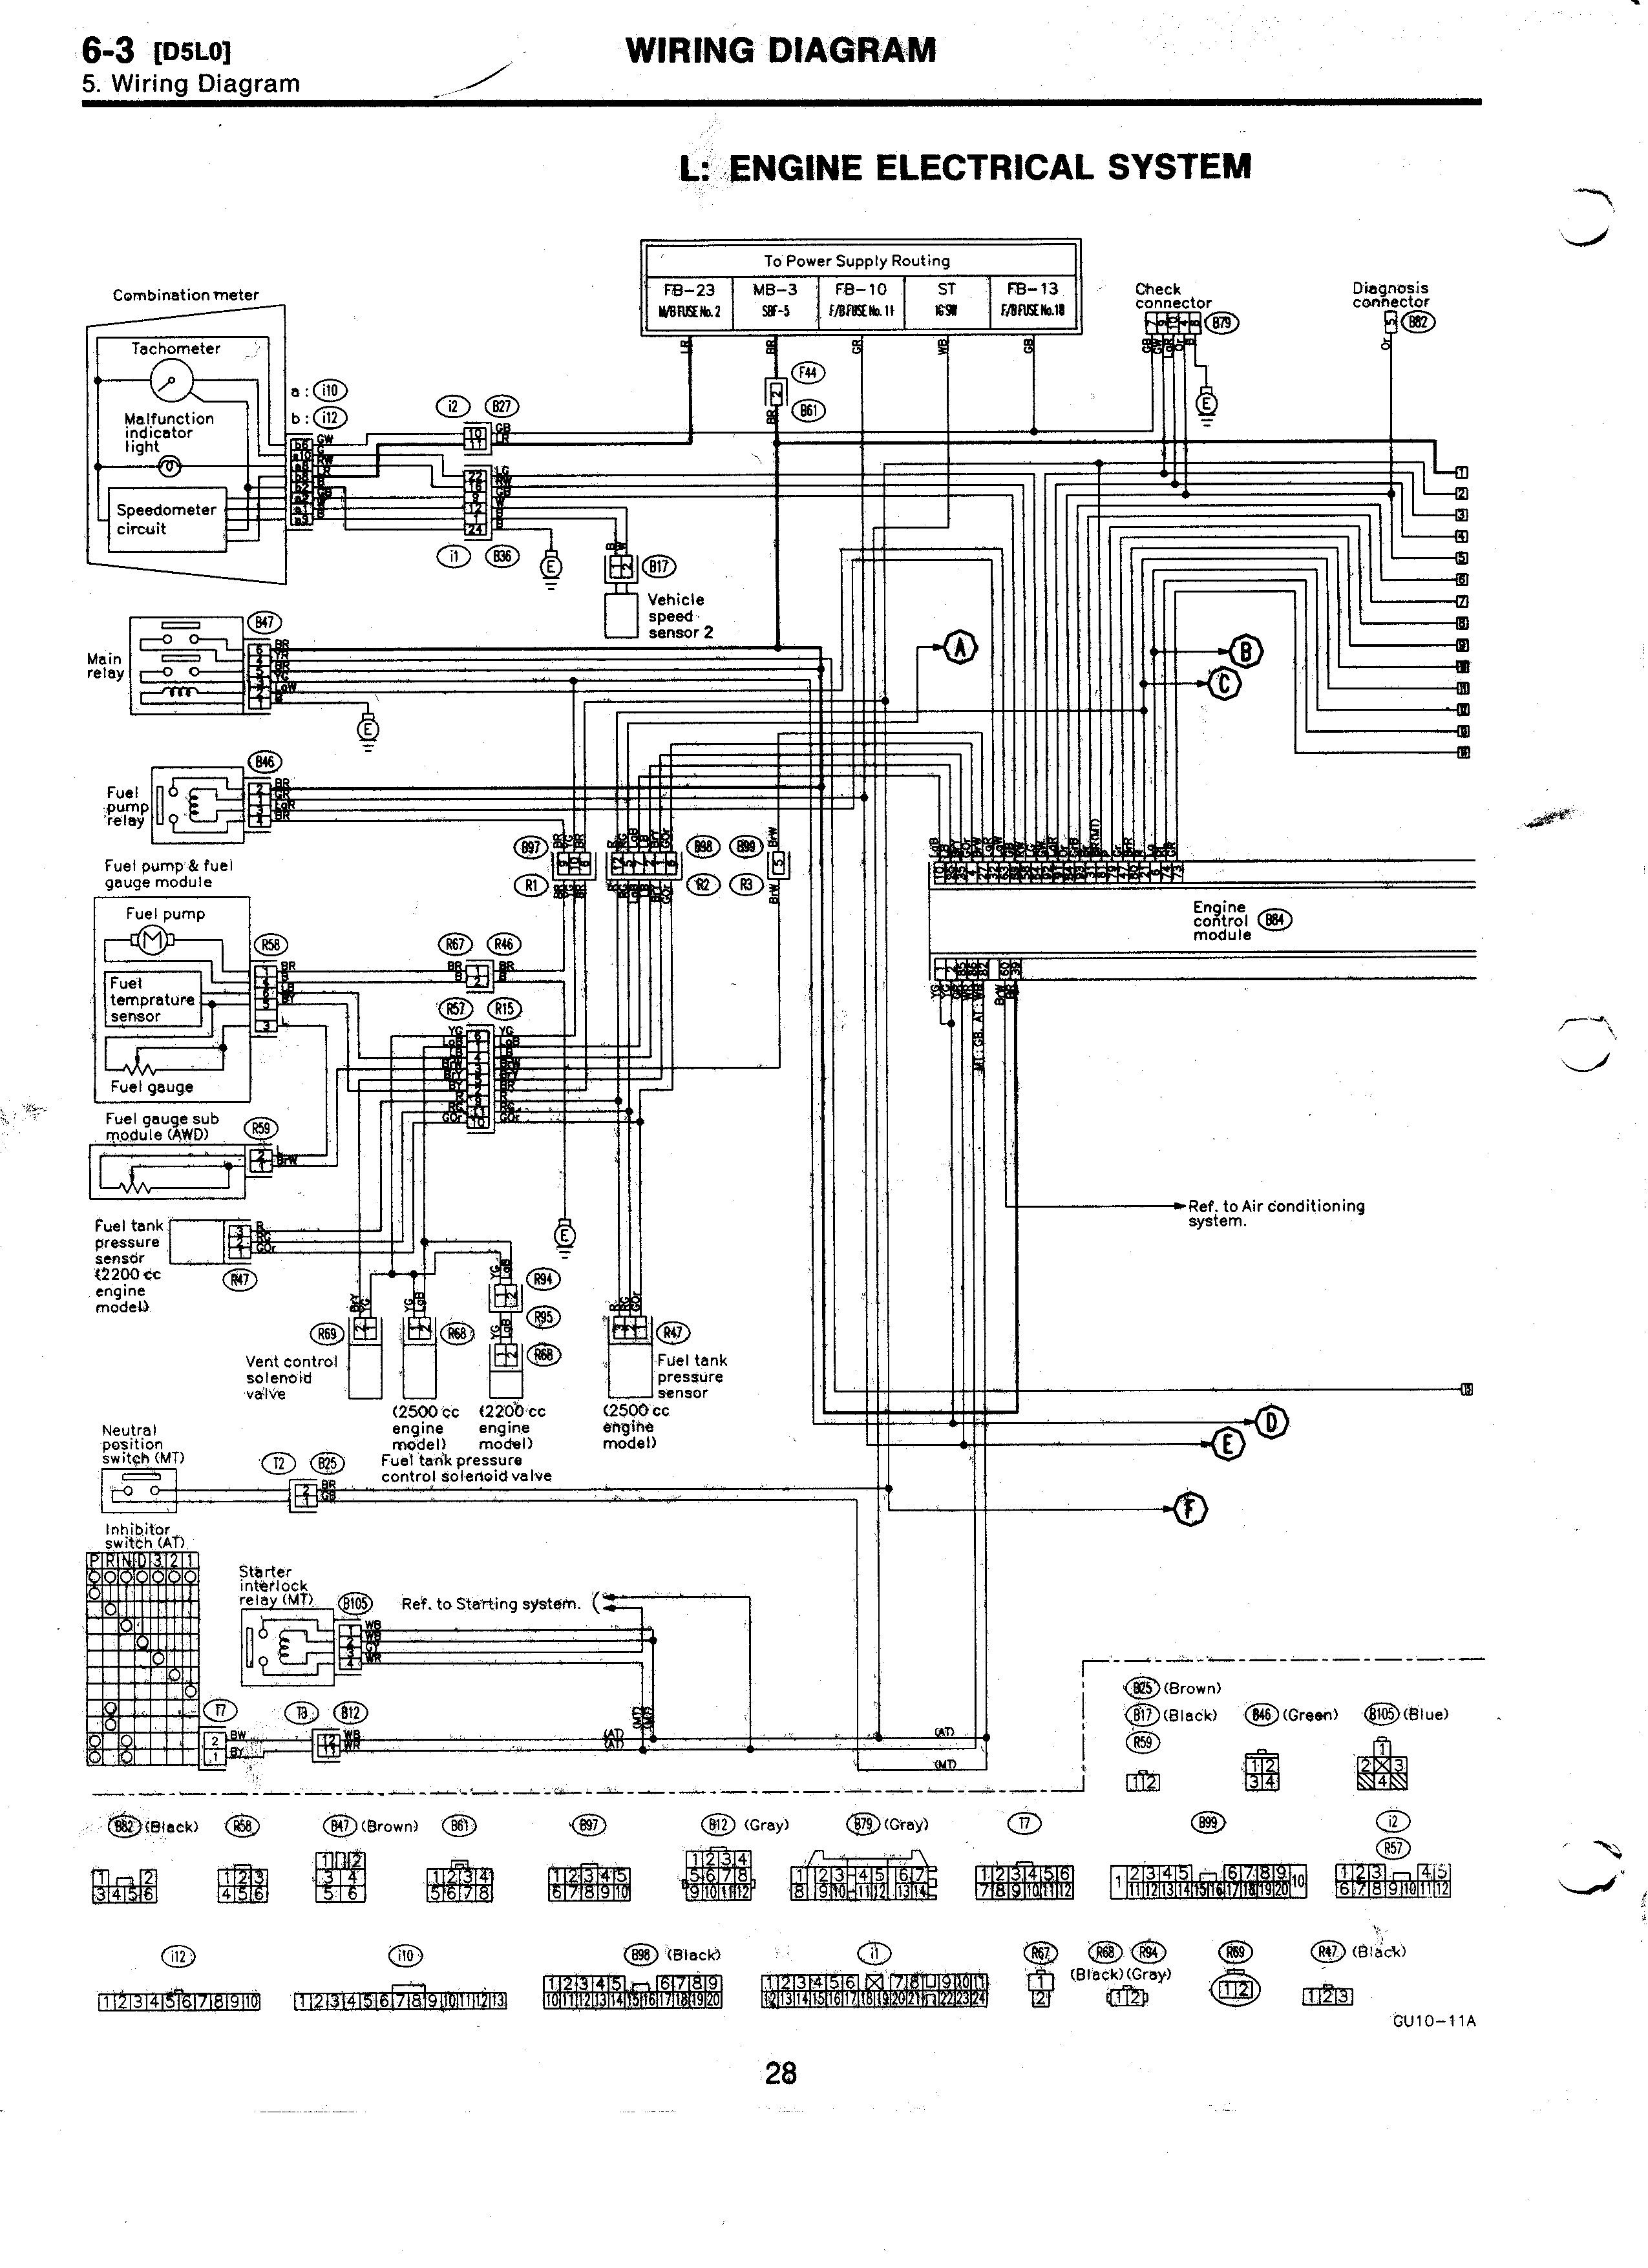 Subaru Legacy Engine Diagram In 2021 Subaru Forester Subaru Wrx Engine Subaru